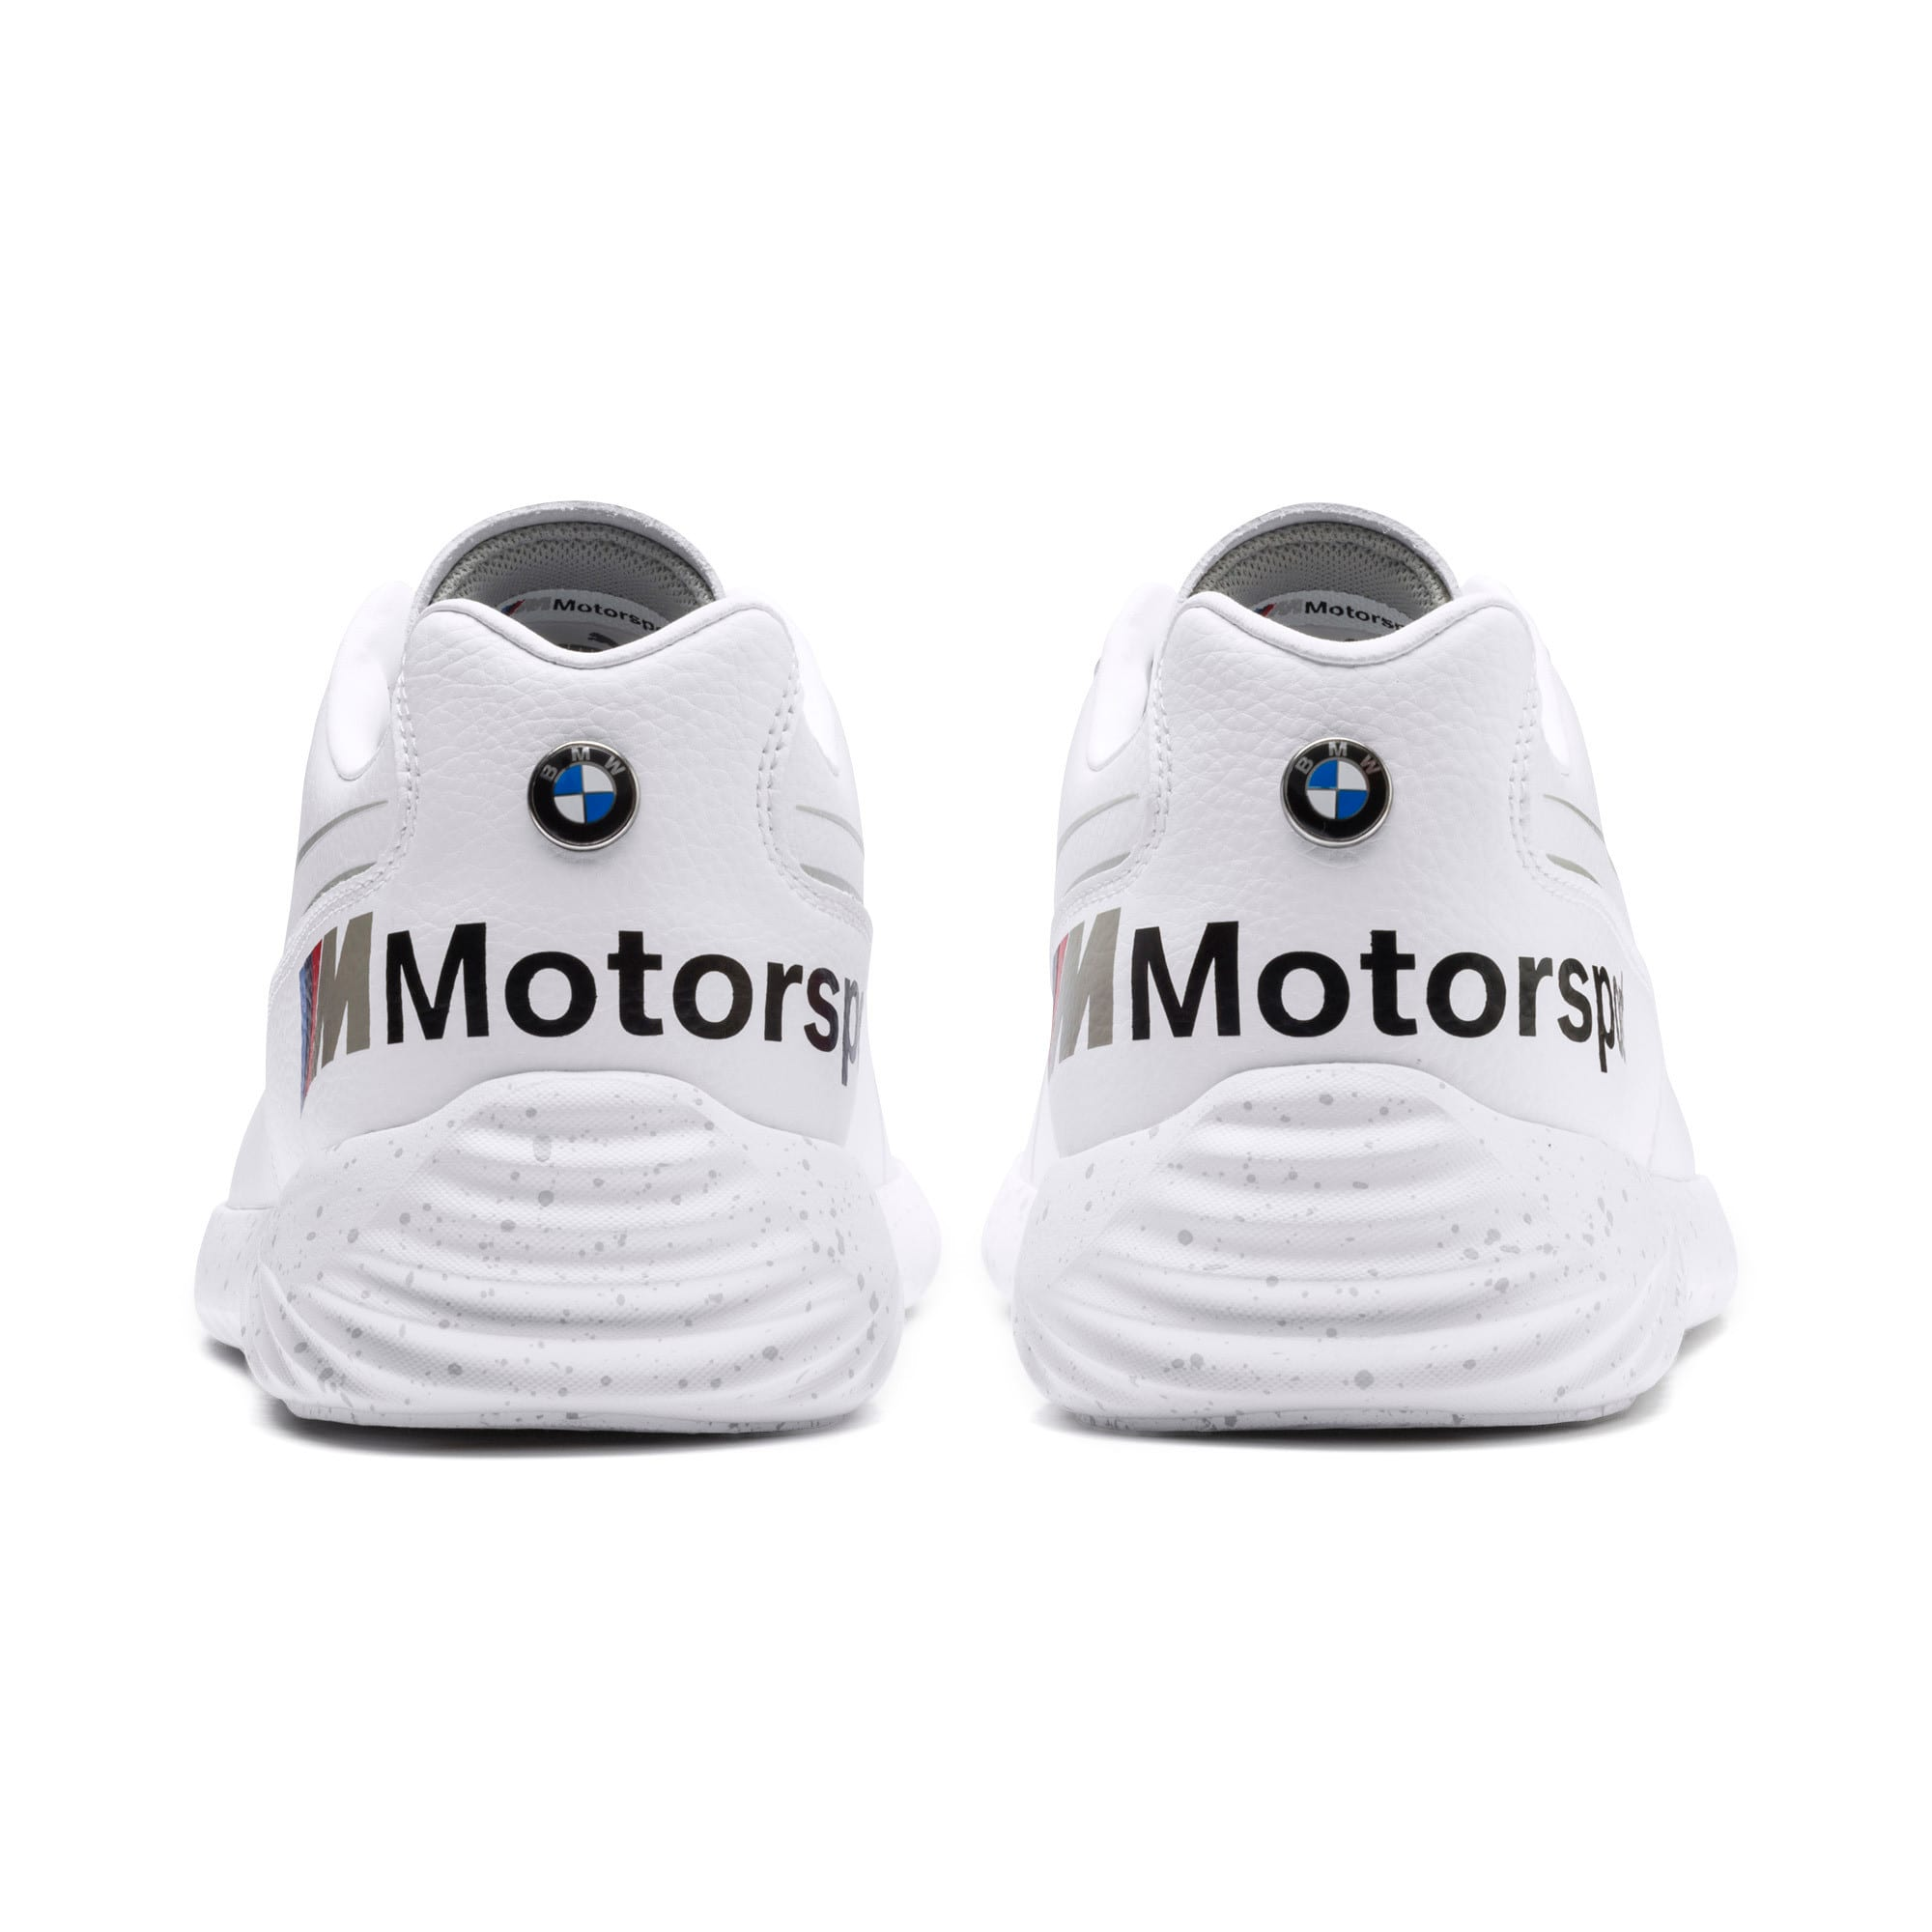 Thumbnail 4 of BMW M Motorsport Speedcat Evo Shoes, Puma White-Puma White, medium